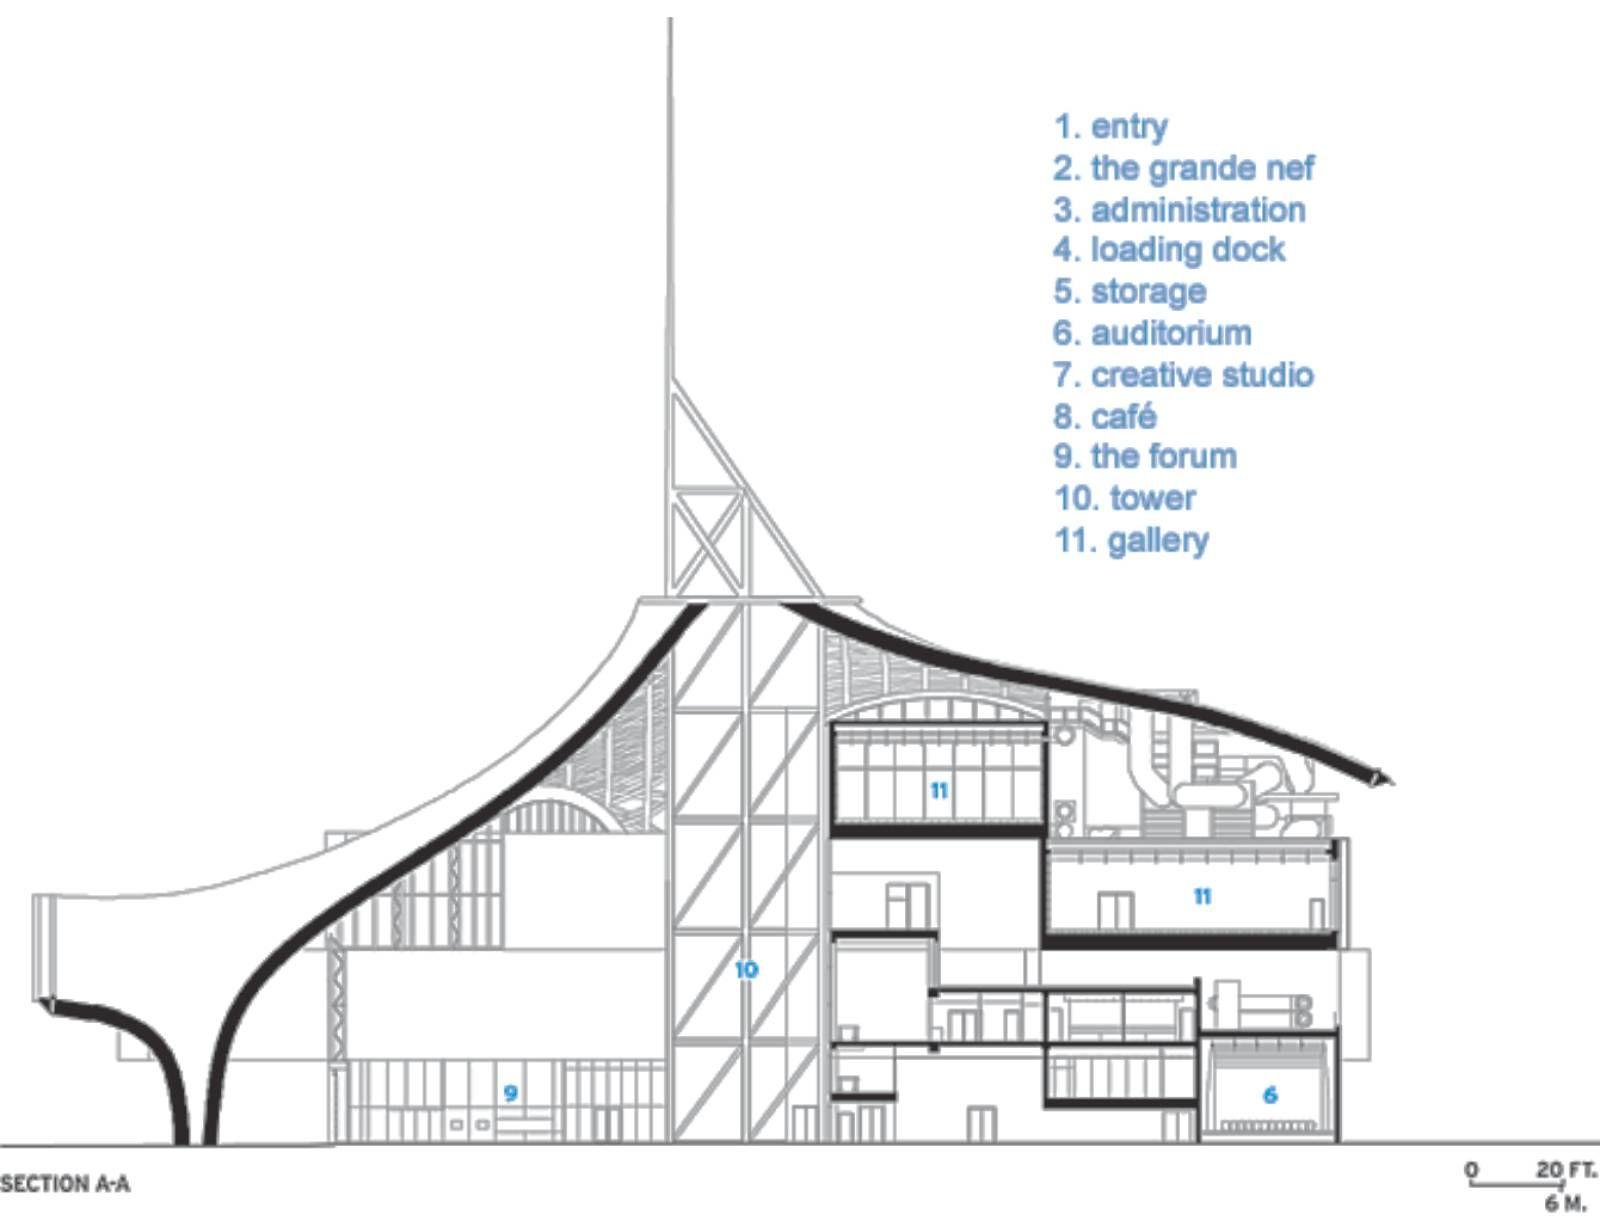 Centre Pompidou Metz Shigeru Ban Architecture Shigeruban